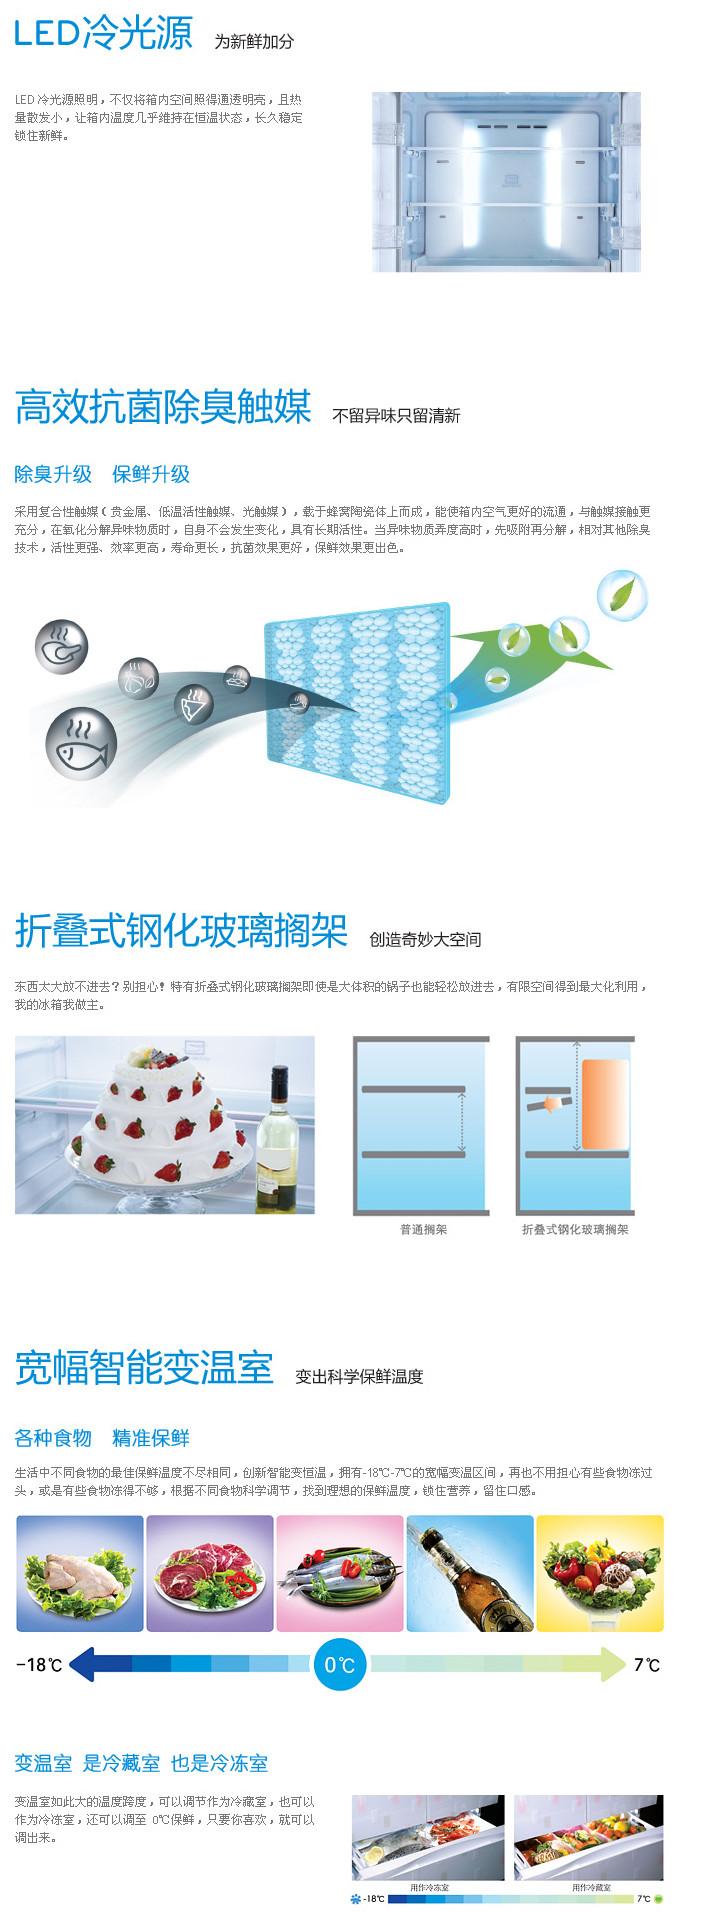 lg (lg) 231升三开门冰箱 gr-s25nfr 红色(限北京)